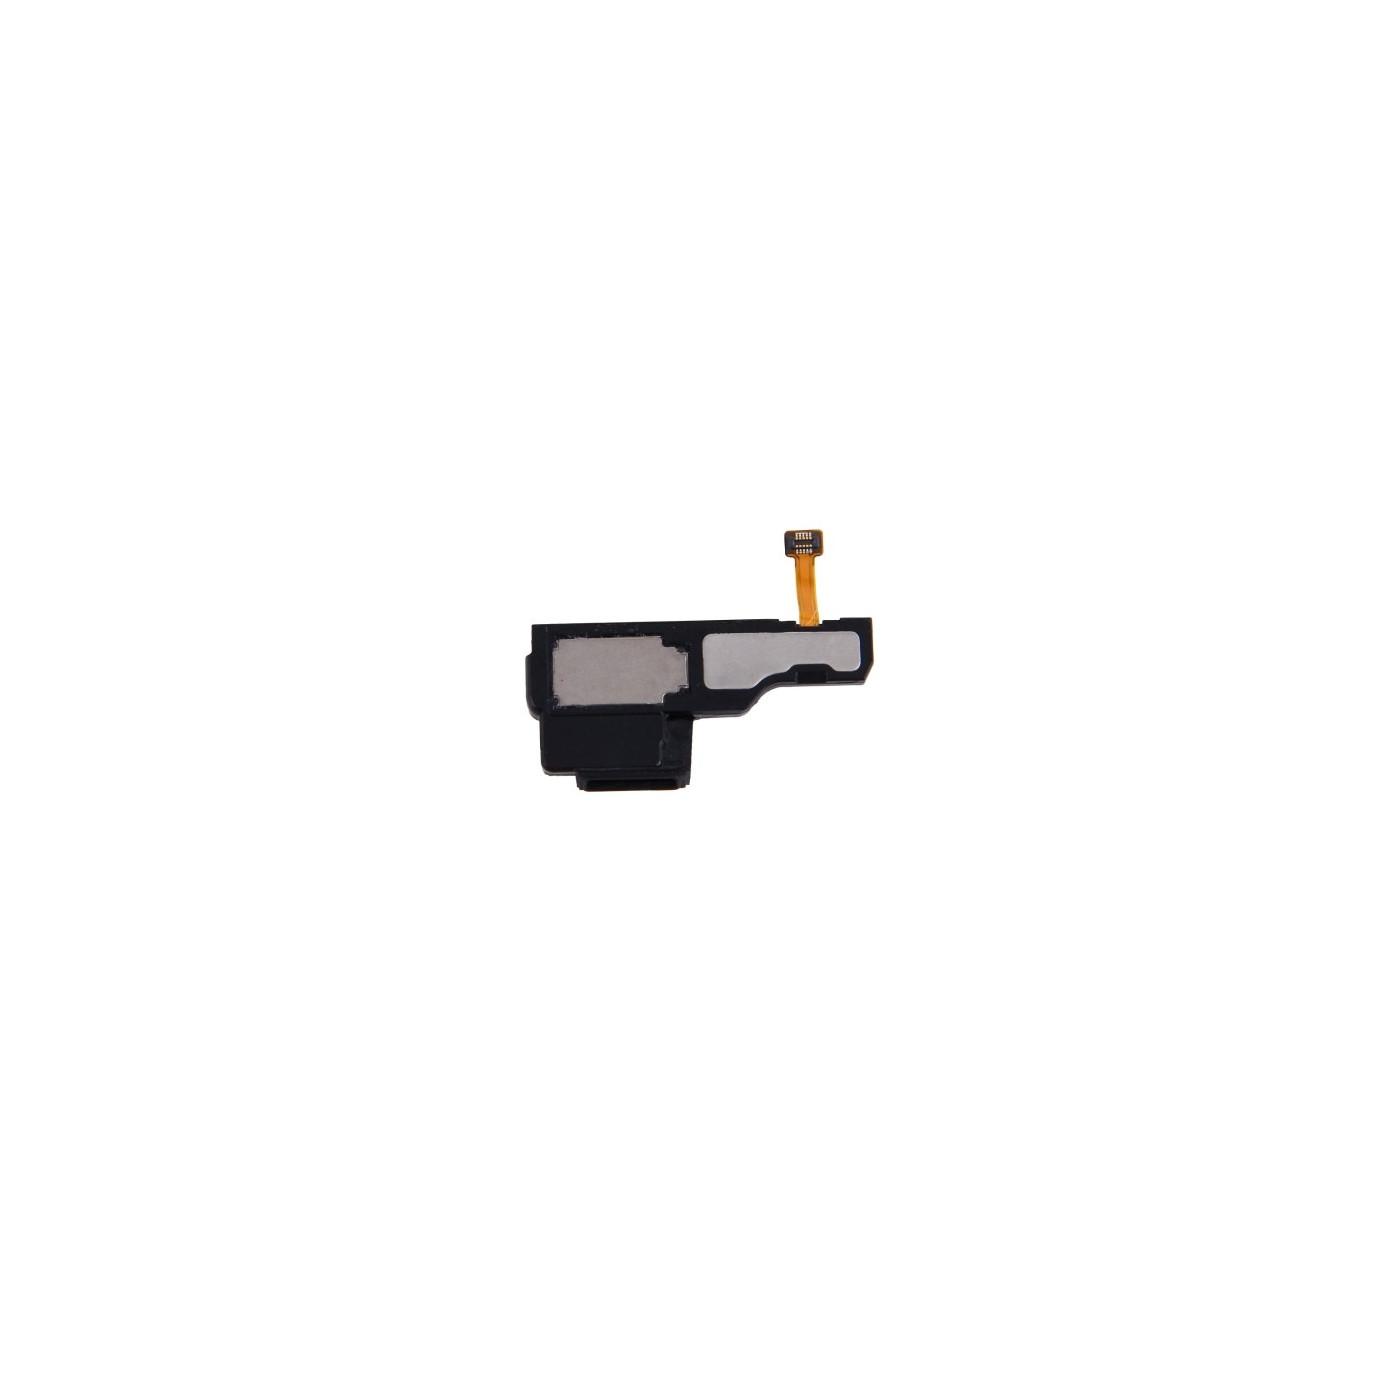 Altavoz caja de altavoz de sonar para HUAWEI P9